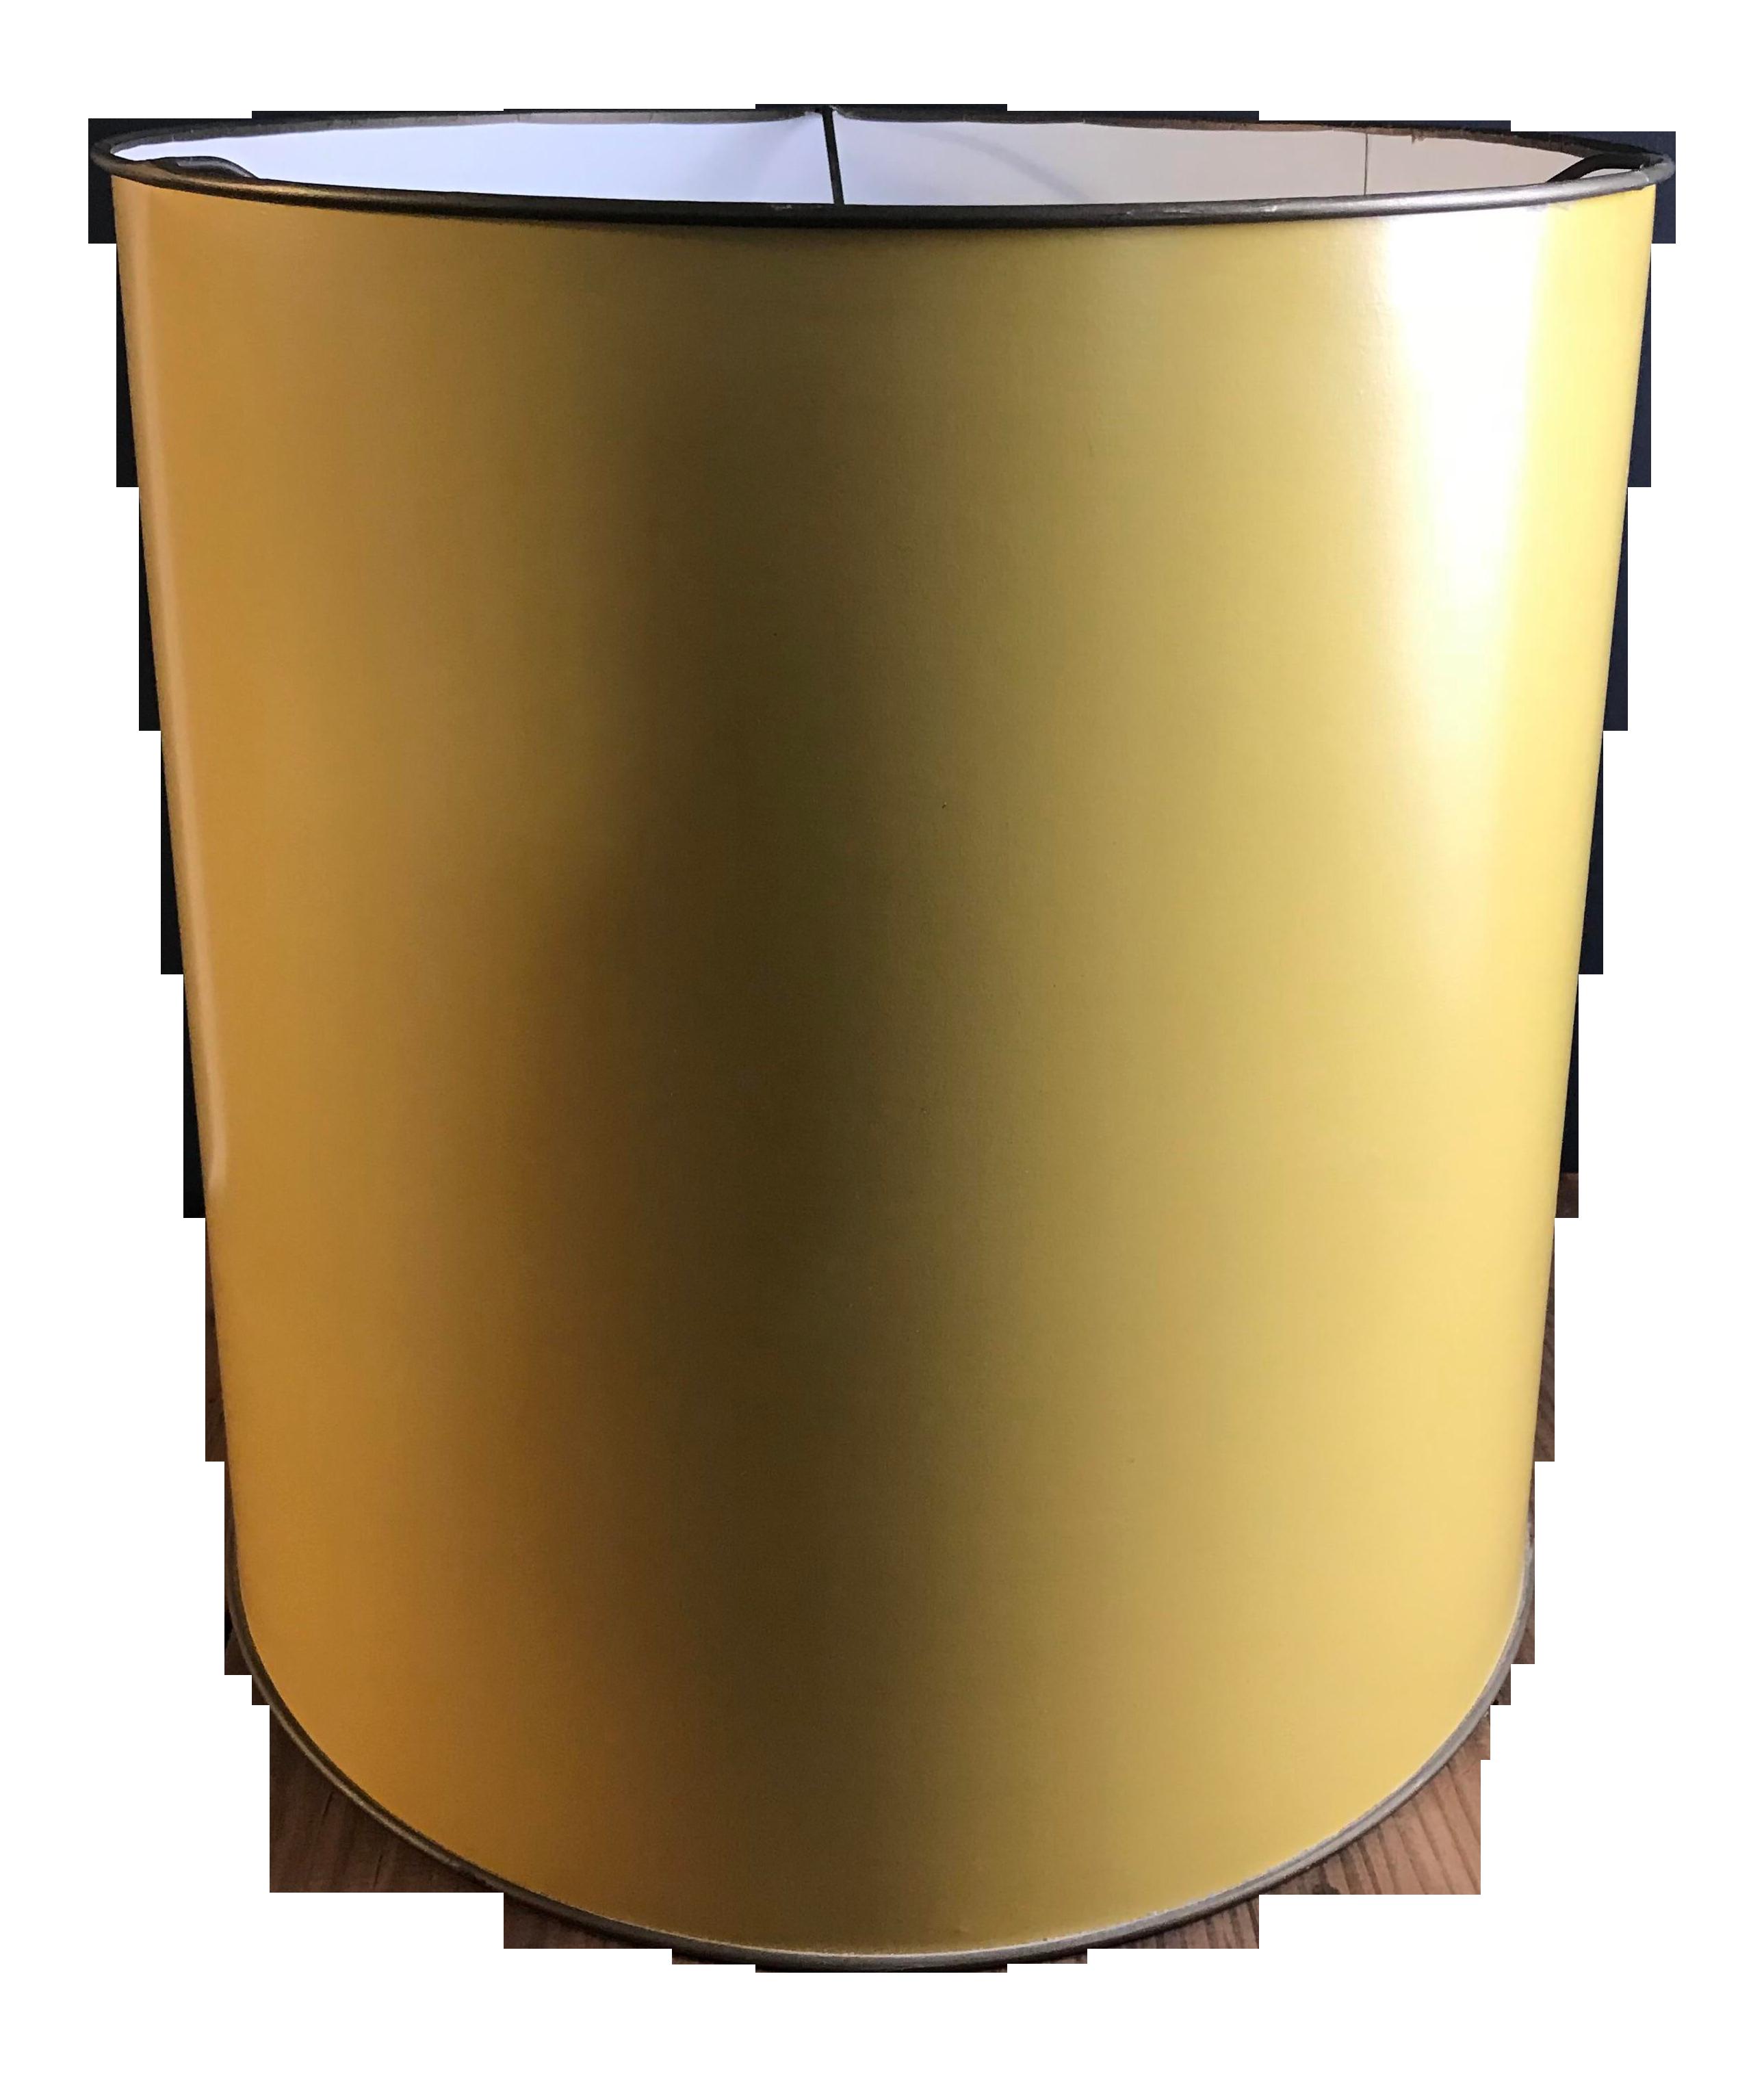 Picture of: Mid Century Modern Mustard Lamp Shade Chairish